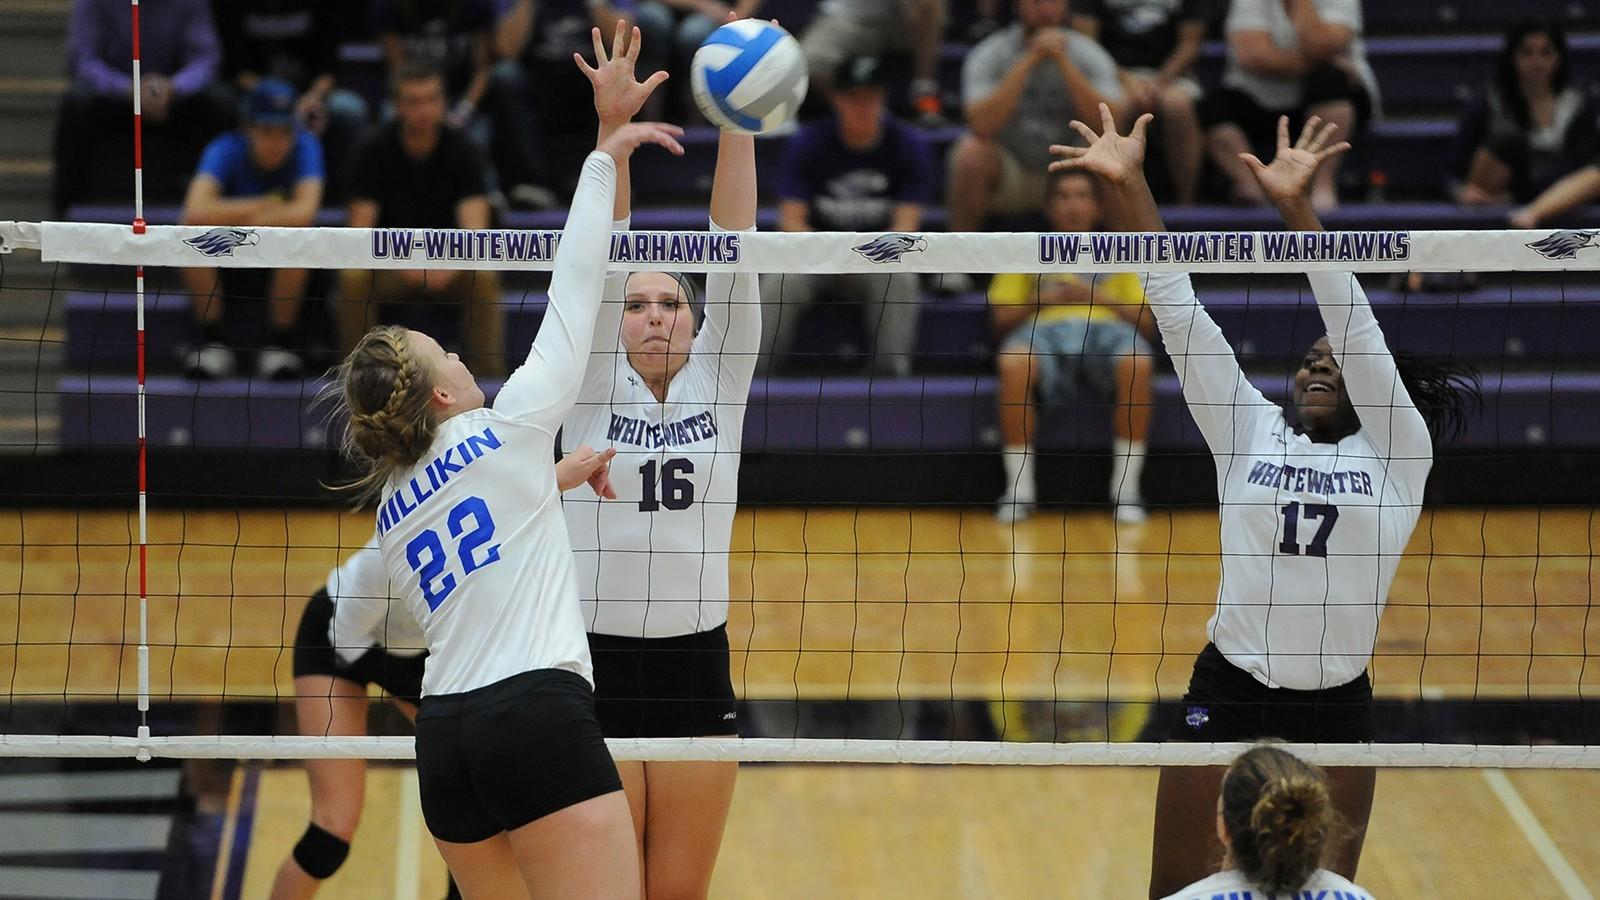 Brittney Langley - 2015 - Volleyball - University of